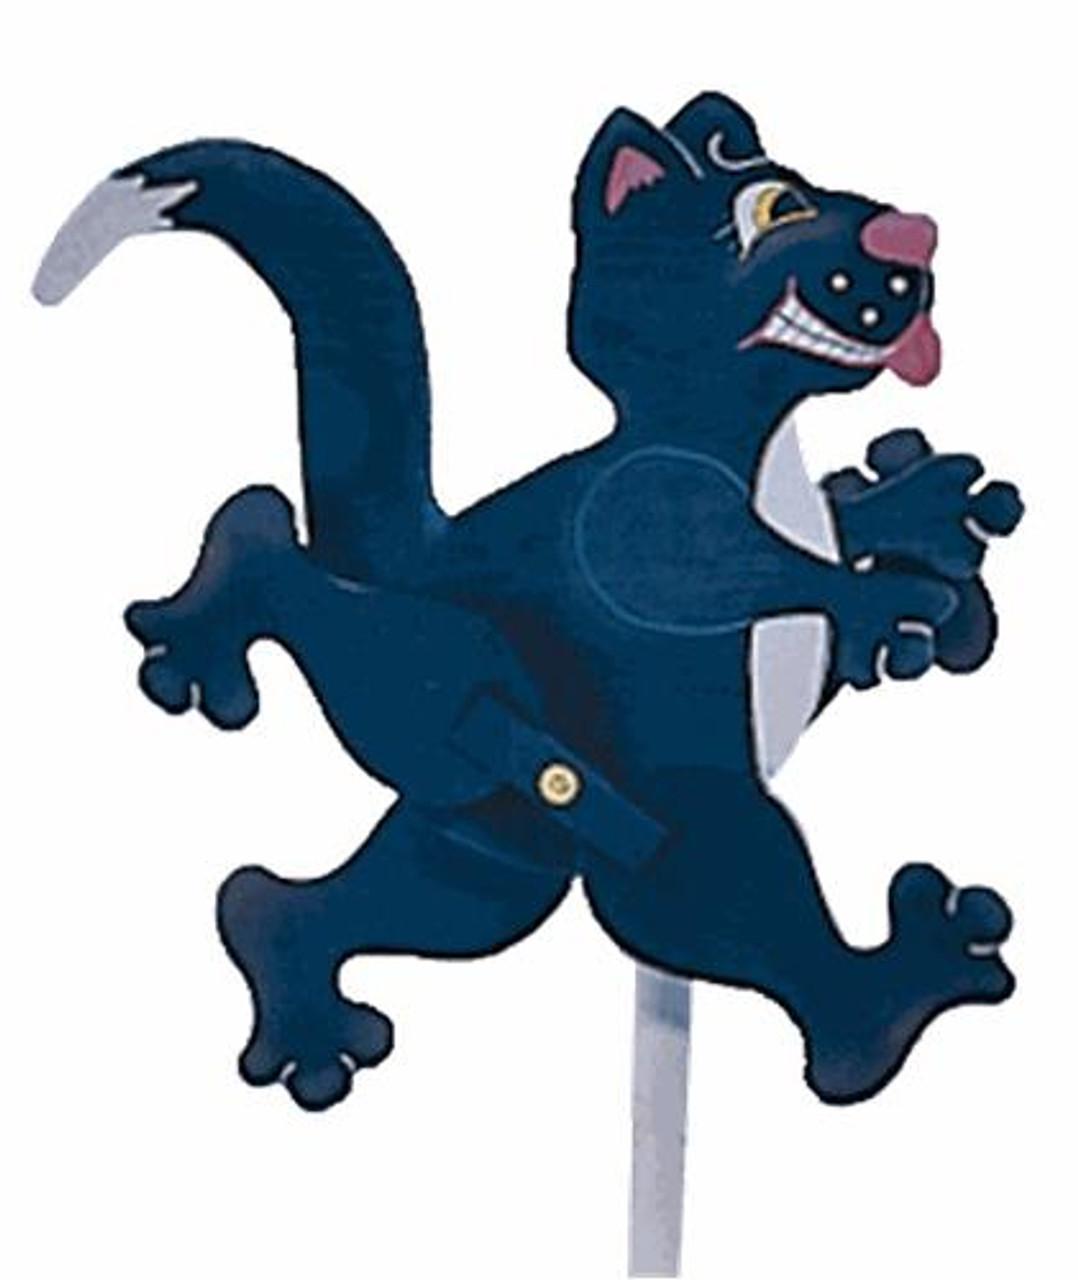 Cherry Tree Toys Cat Whirligig DIY Kit